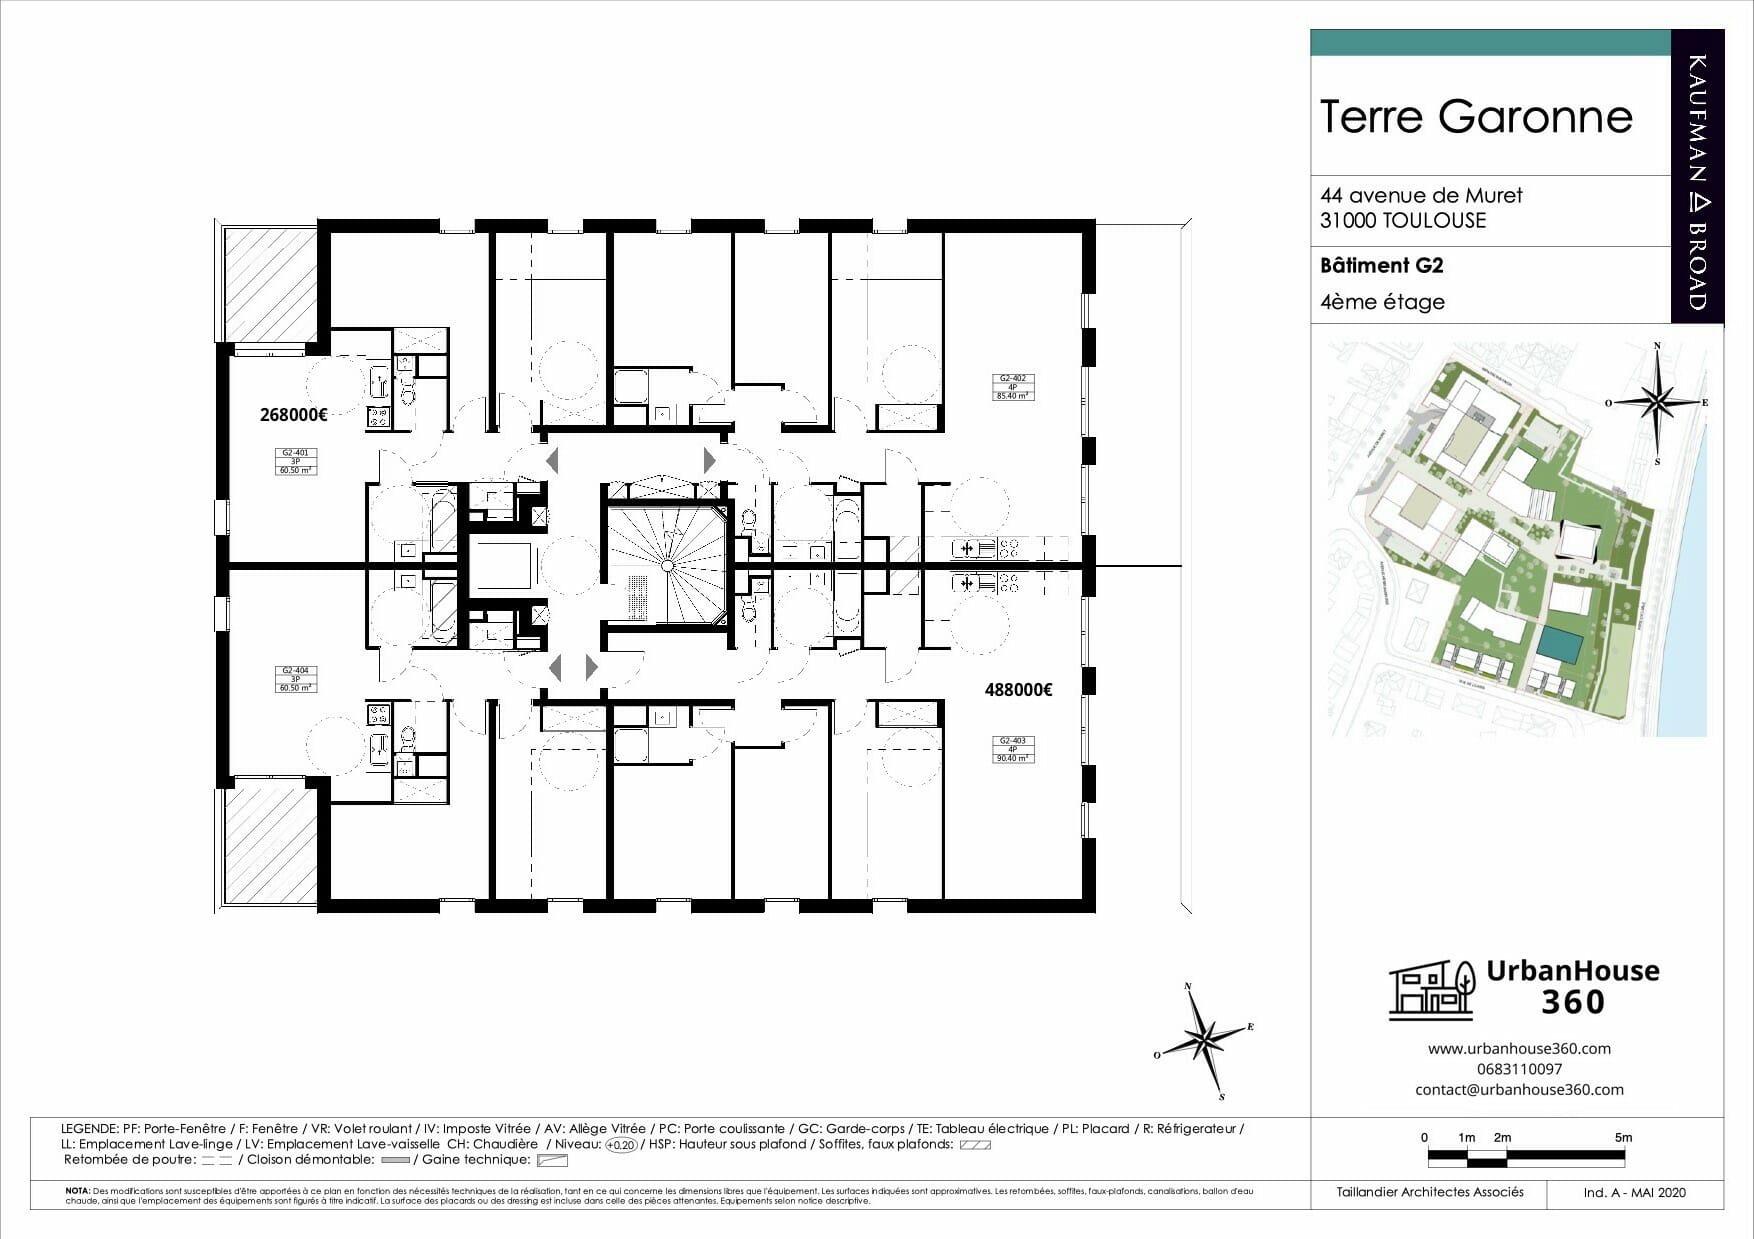 Urbanhouse360-Kaufman-Broad-Terre-Garonne_G2-R+4_2D 2